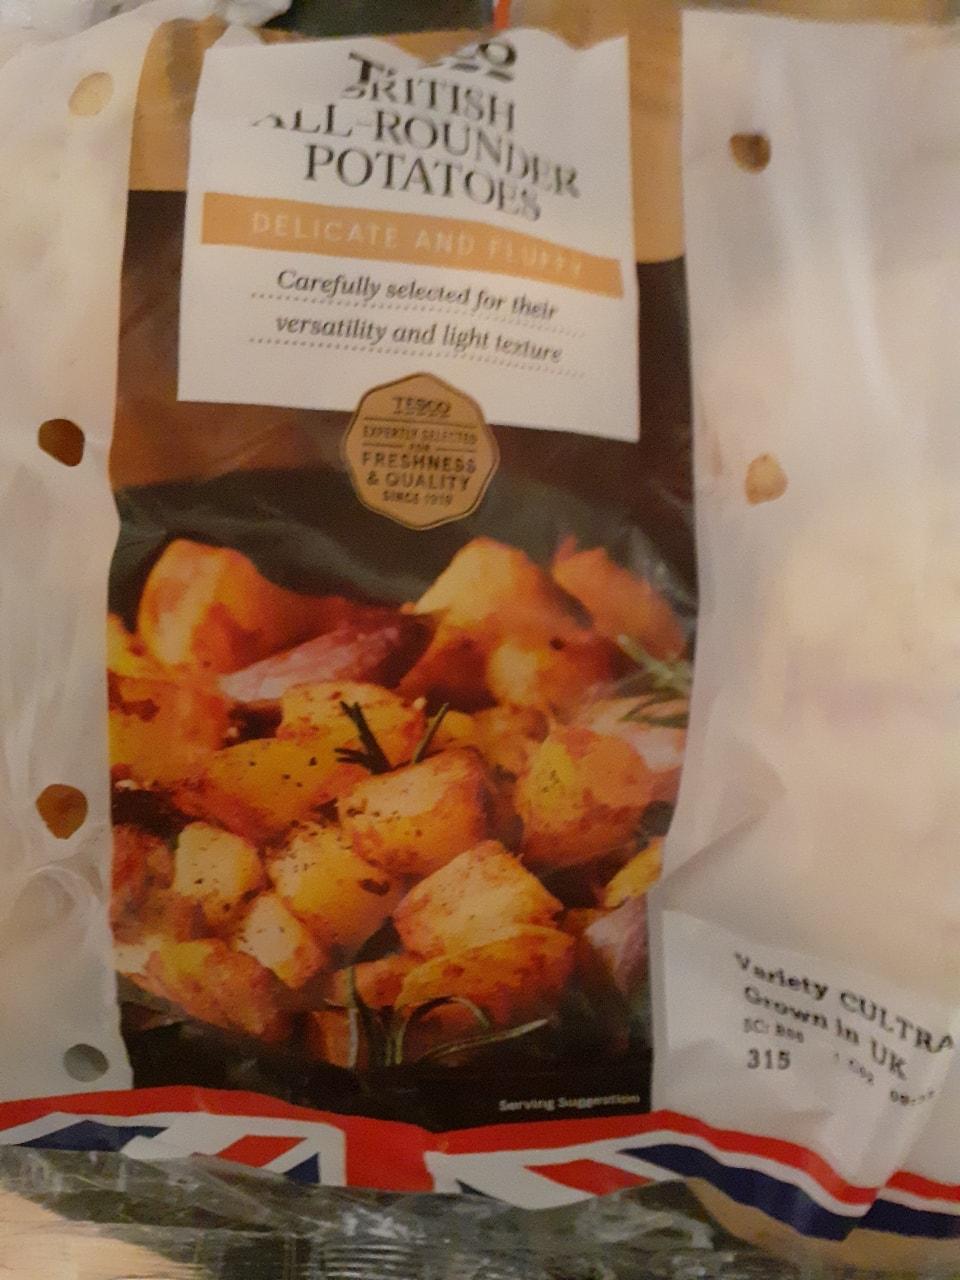 Tesco all rounder potatoes